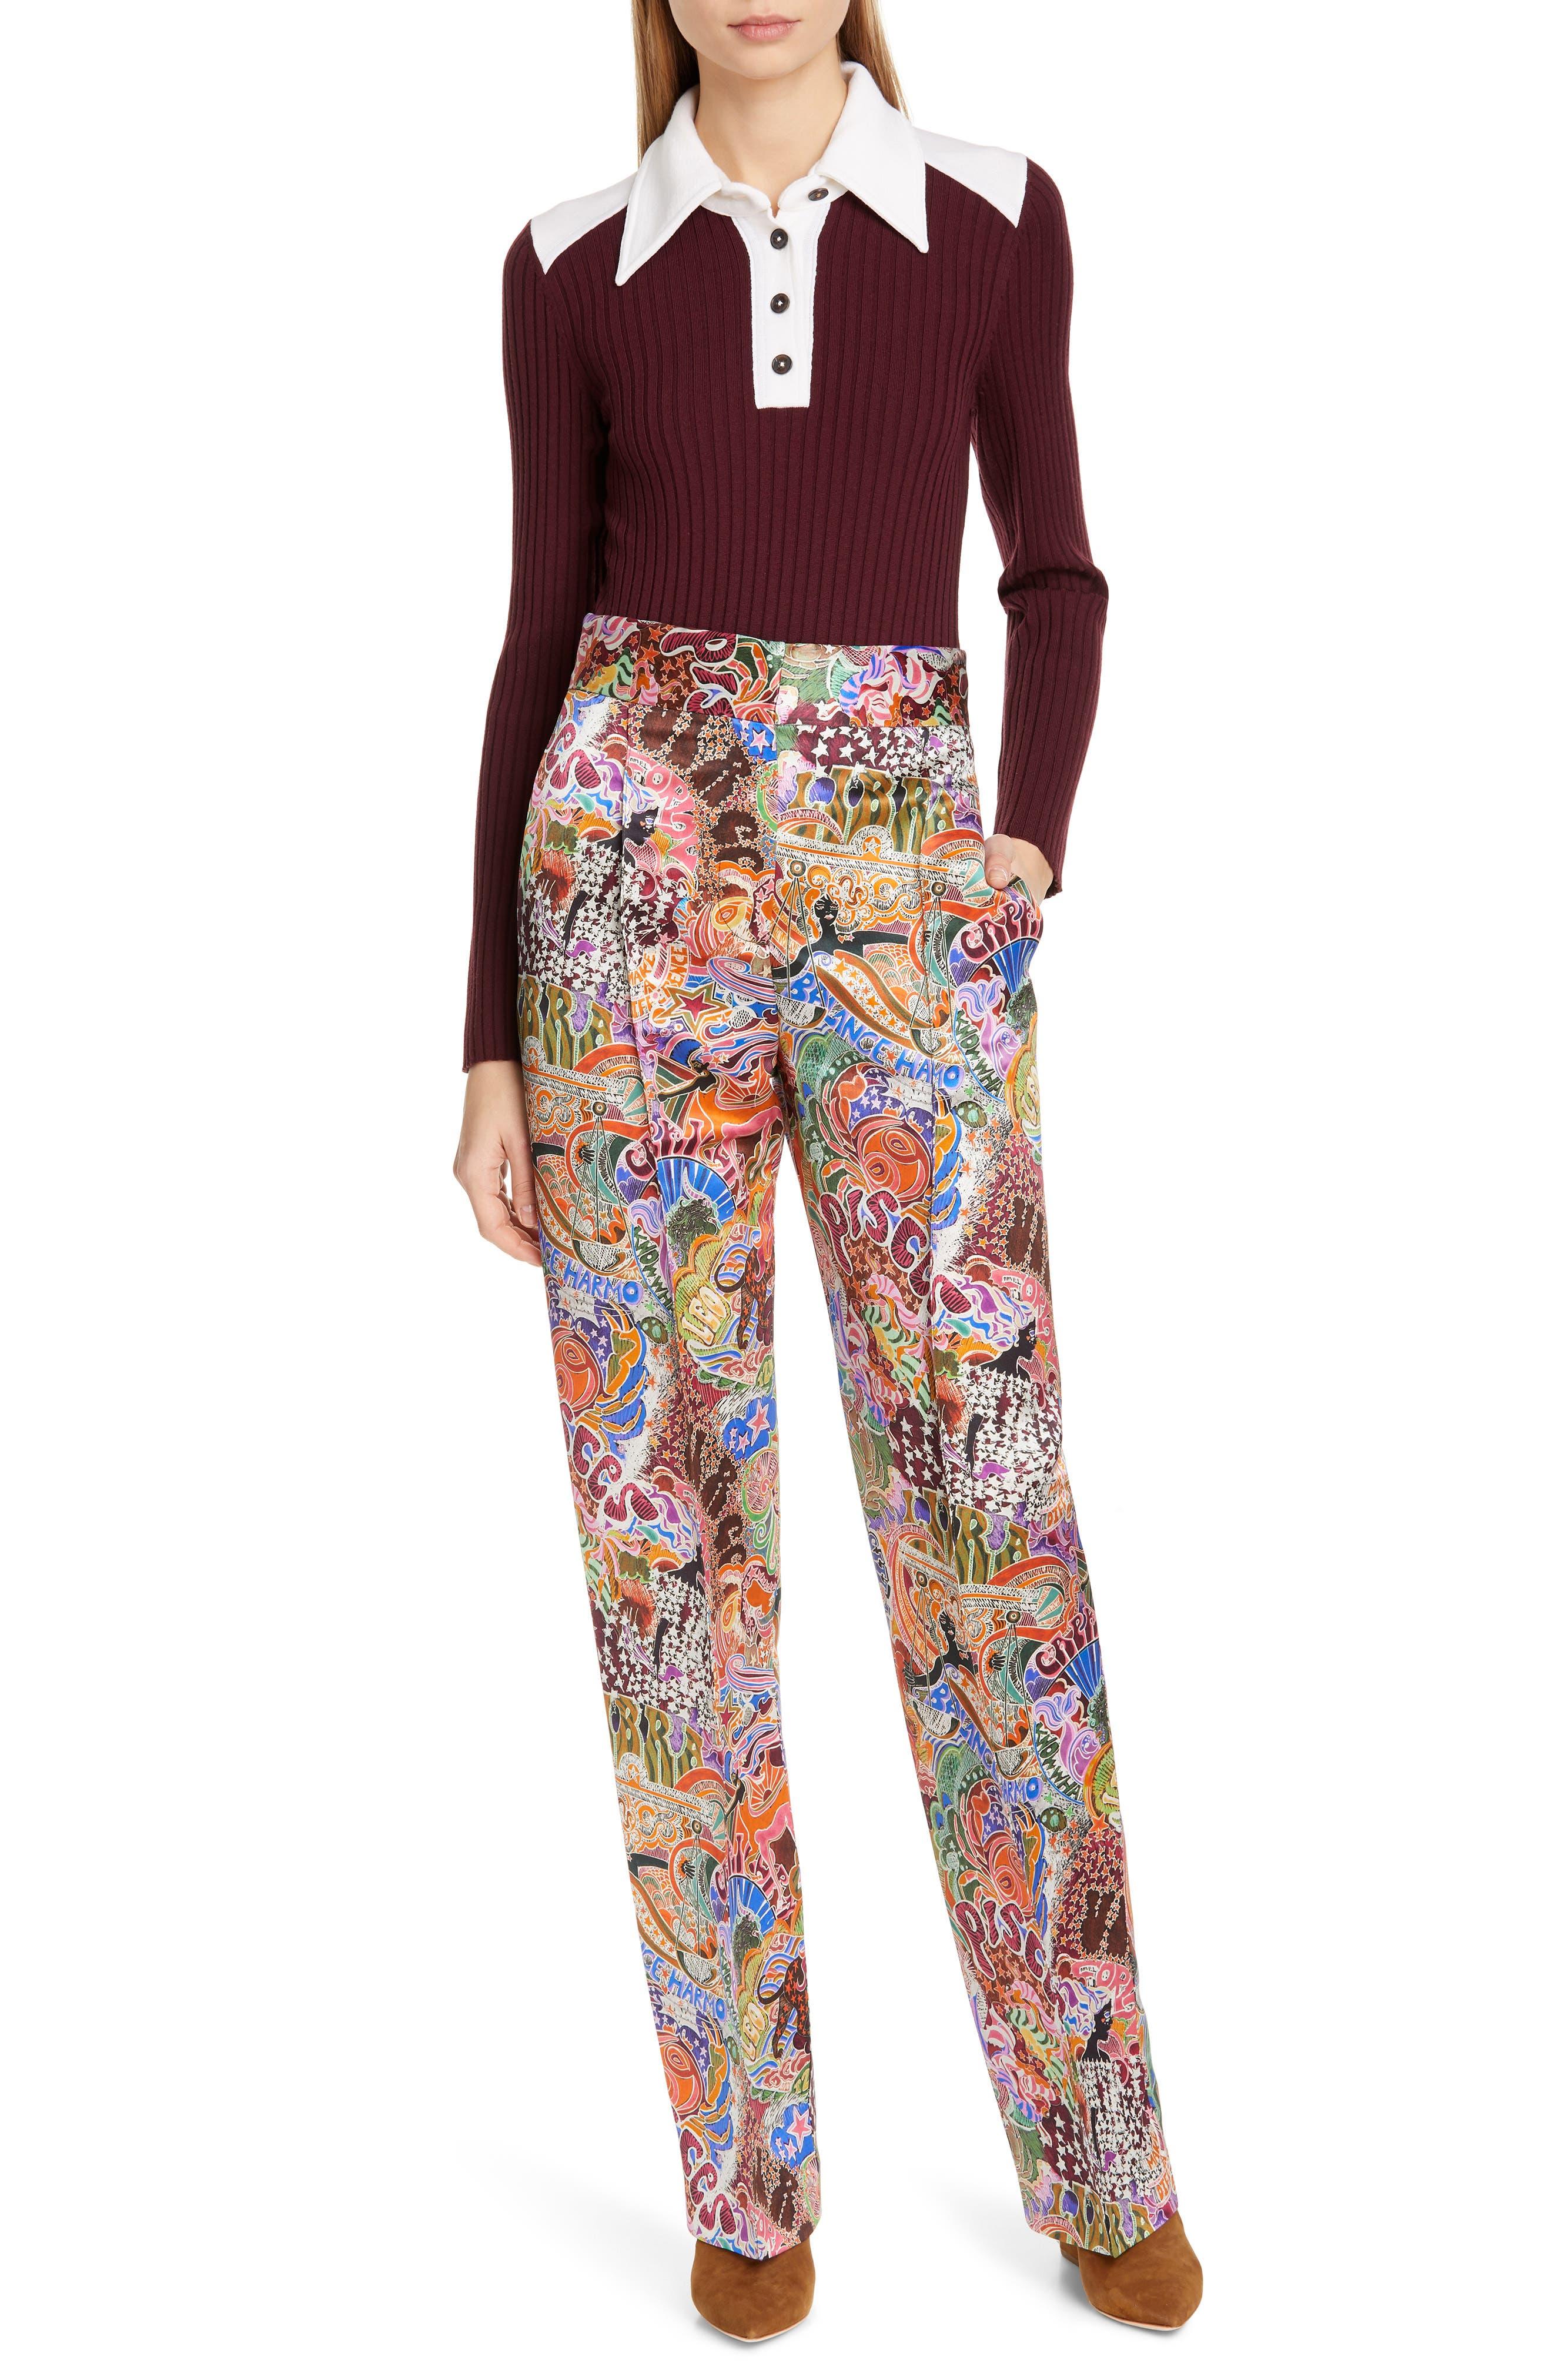 TOMMY X ZENDAYA, Belted Denim Skirt, Alternate thumbnail 7, color, 402